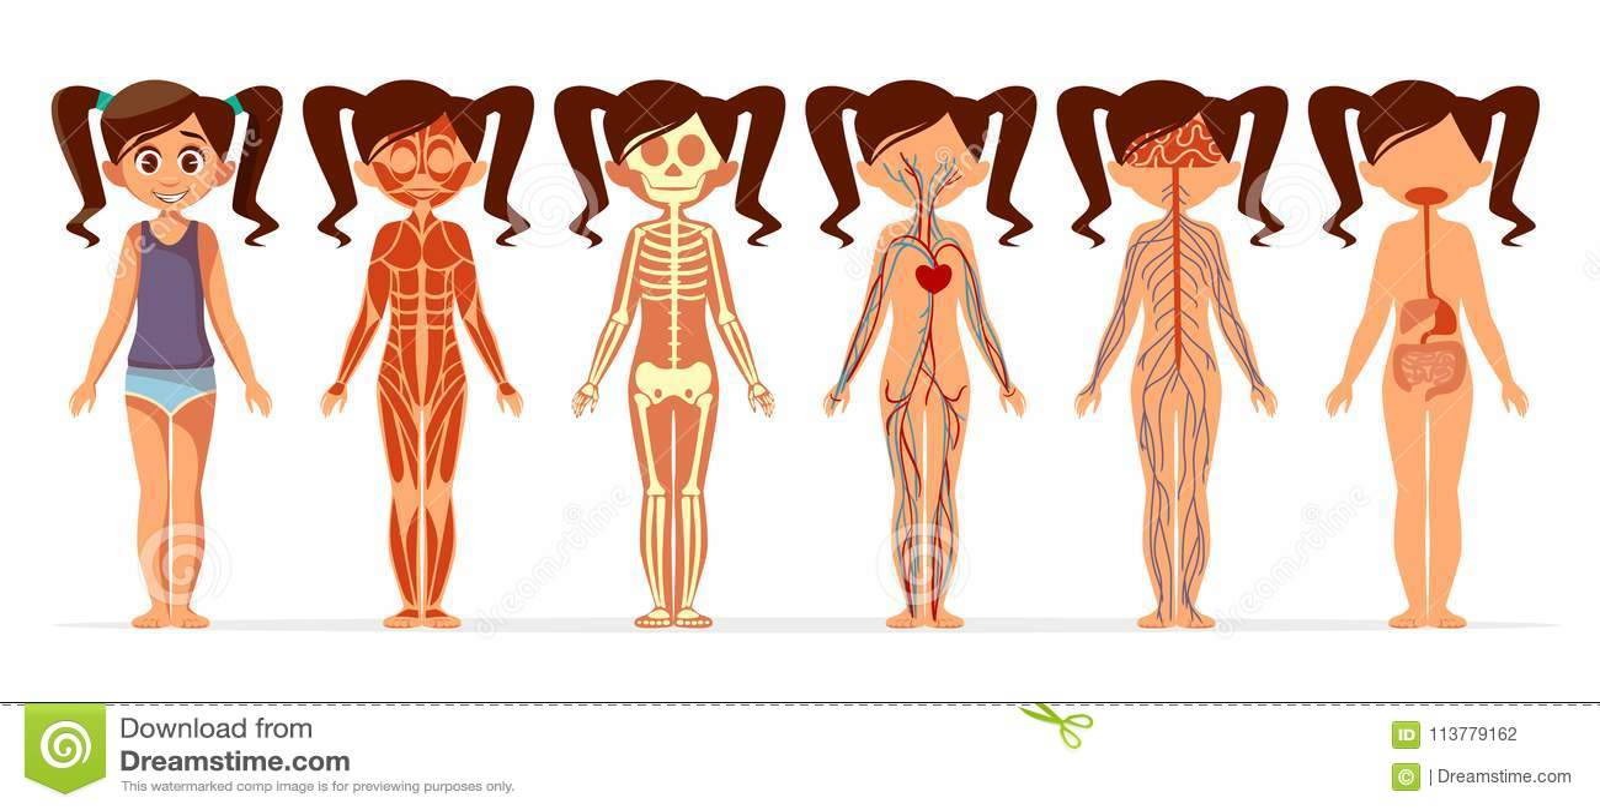 Girl Body Anatomy Vector Cartoon Illustration Of Female Muscular